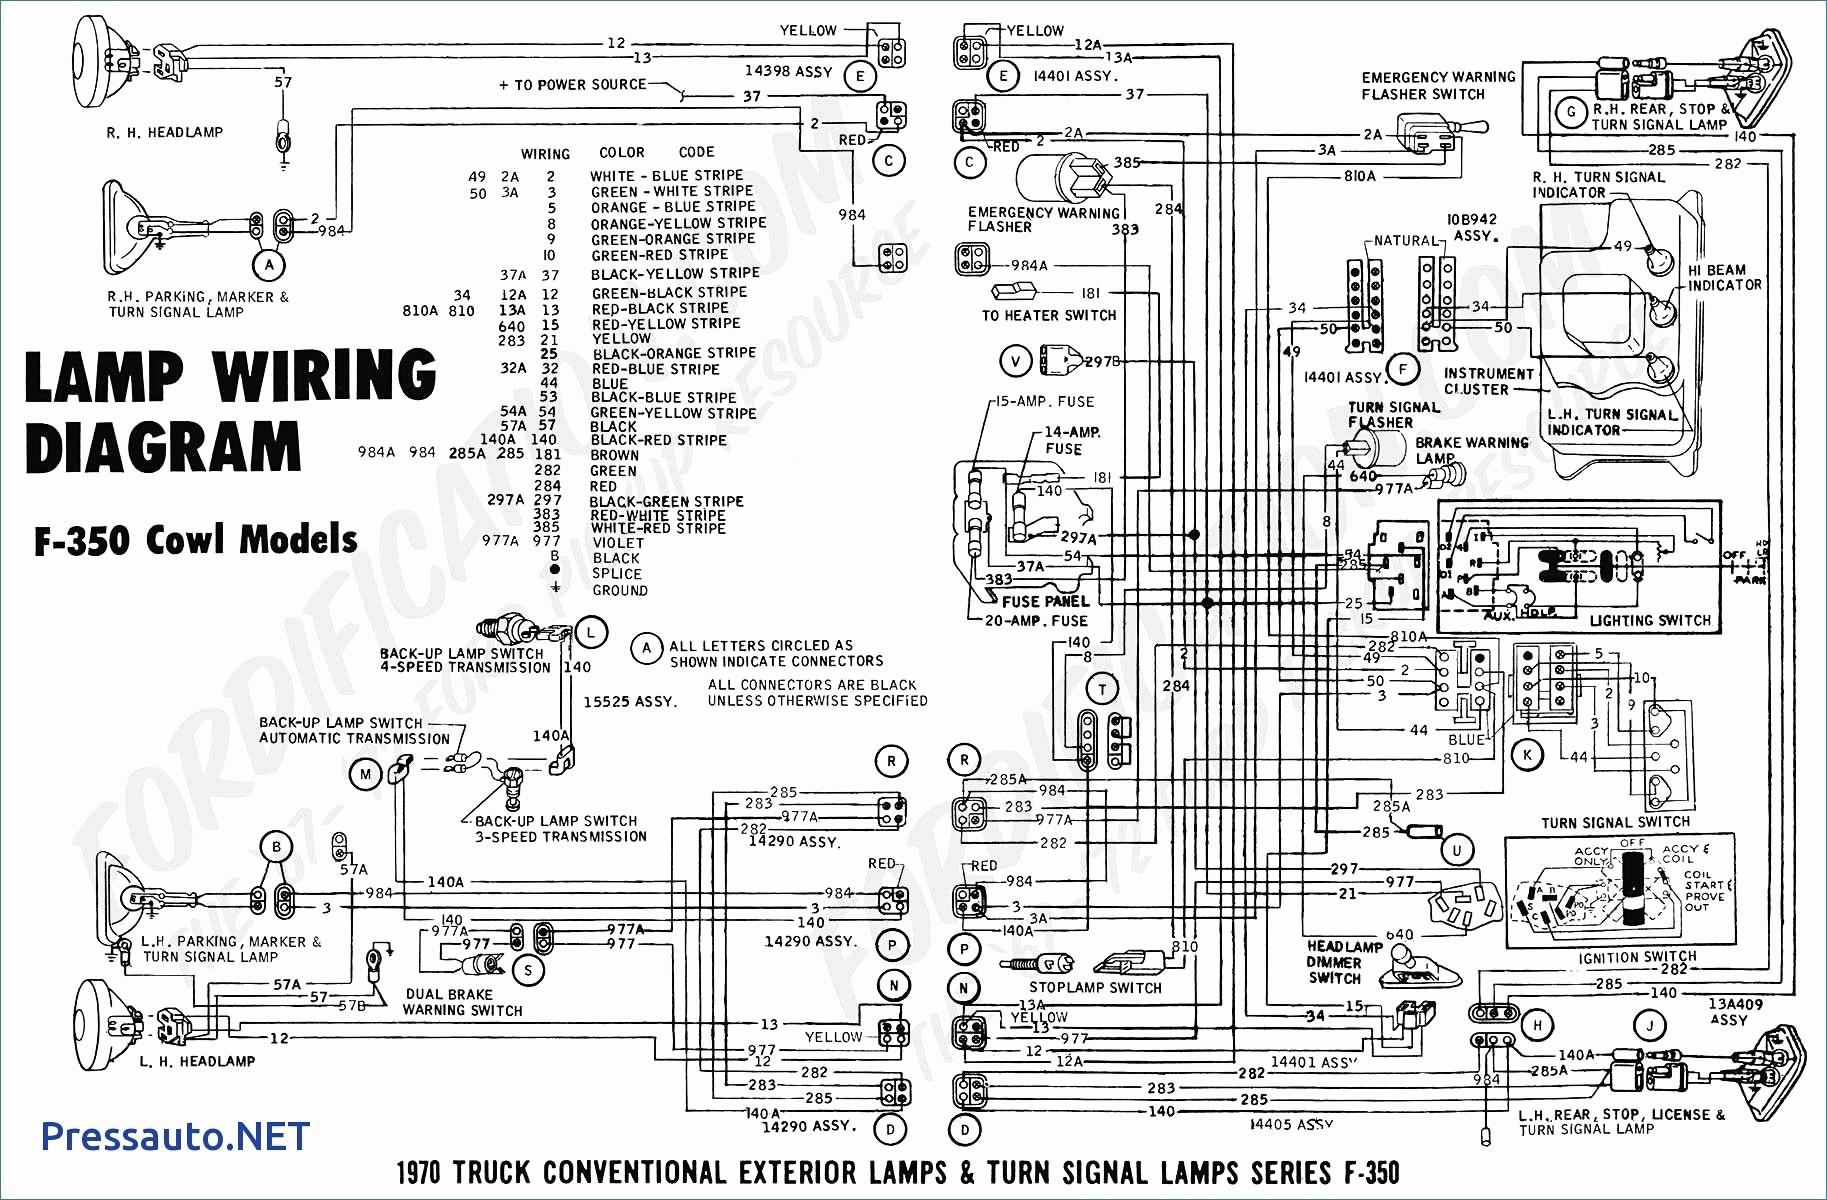 Spartan Cj5 Wiring Diagram - F 550 Wiring Diagram Ac - electrical-wiring .tukune.jeanjaures37.fr   Spartan Wiring Diagrams      Wiring Diagram Resource